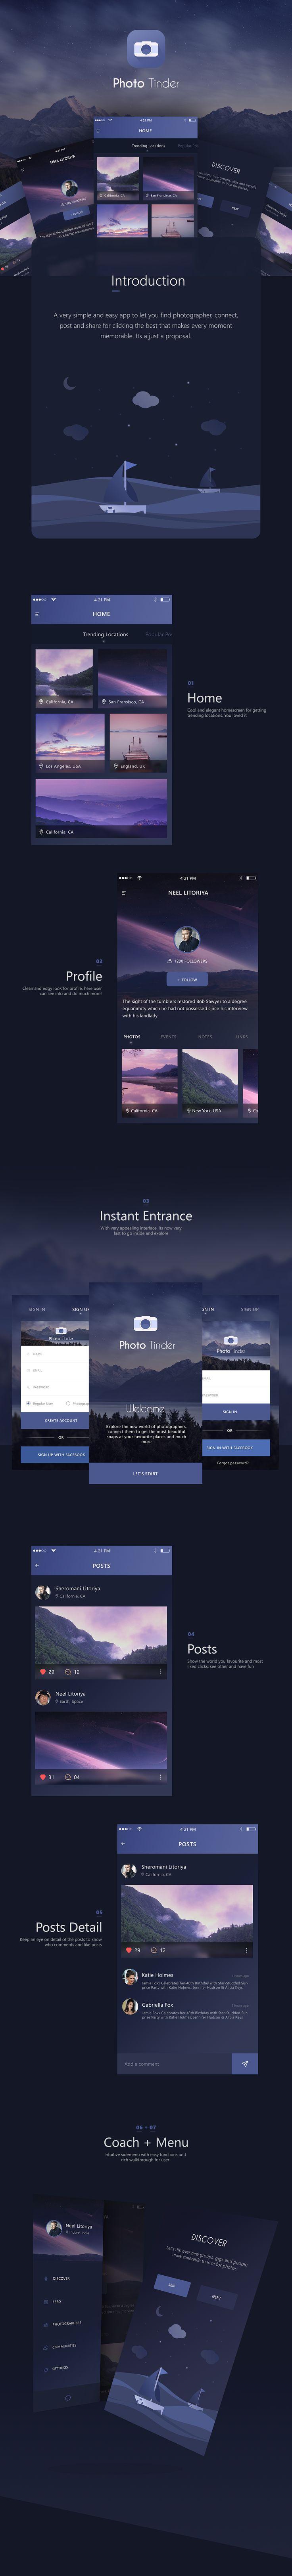 Photo Tinder app UI on Behance